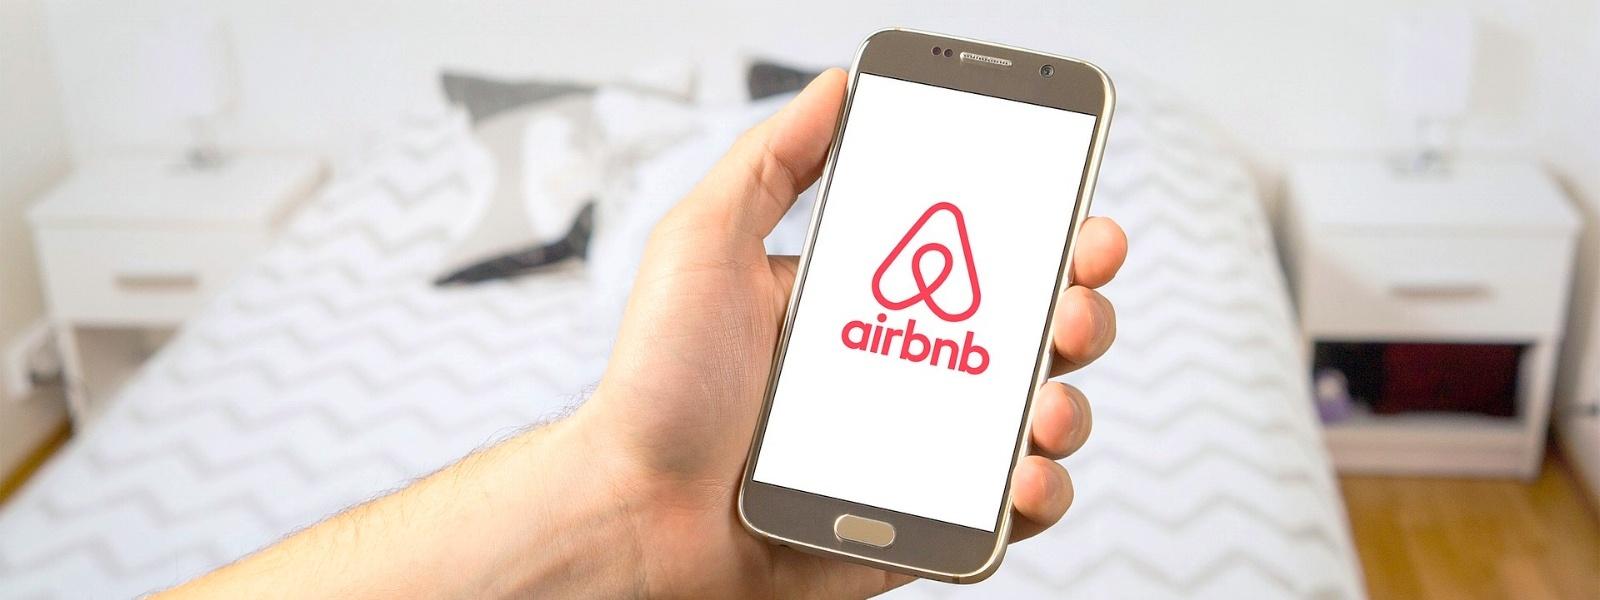 airbnb-2384737_1920-571577-edited.jpg